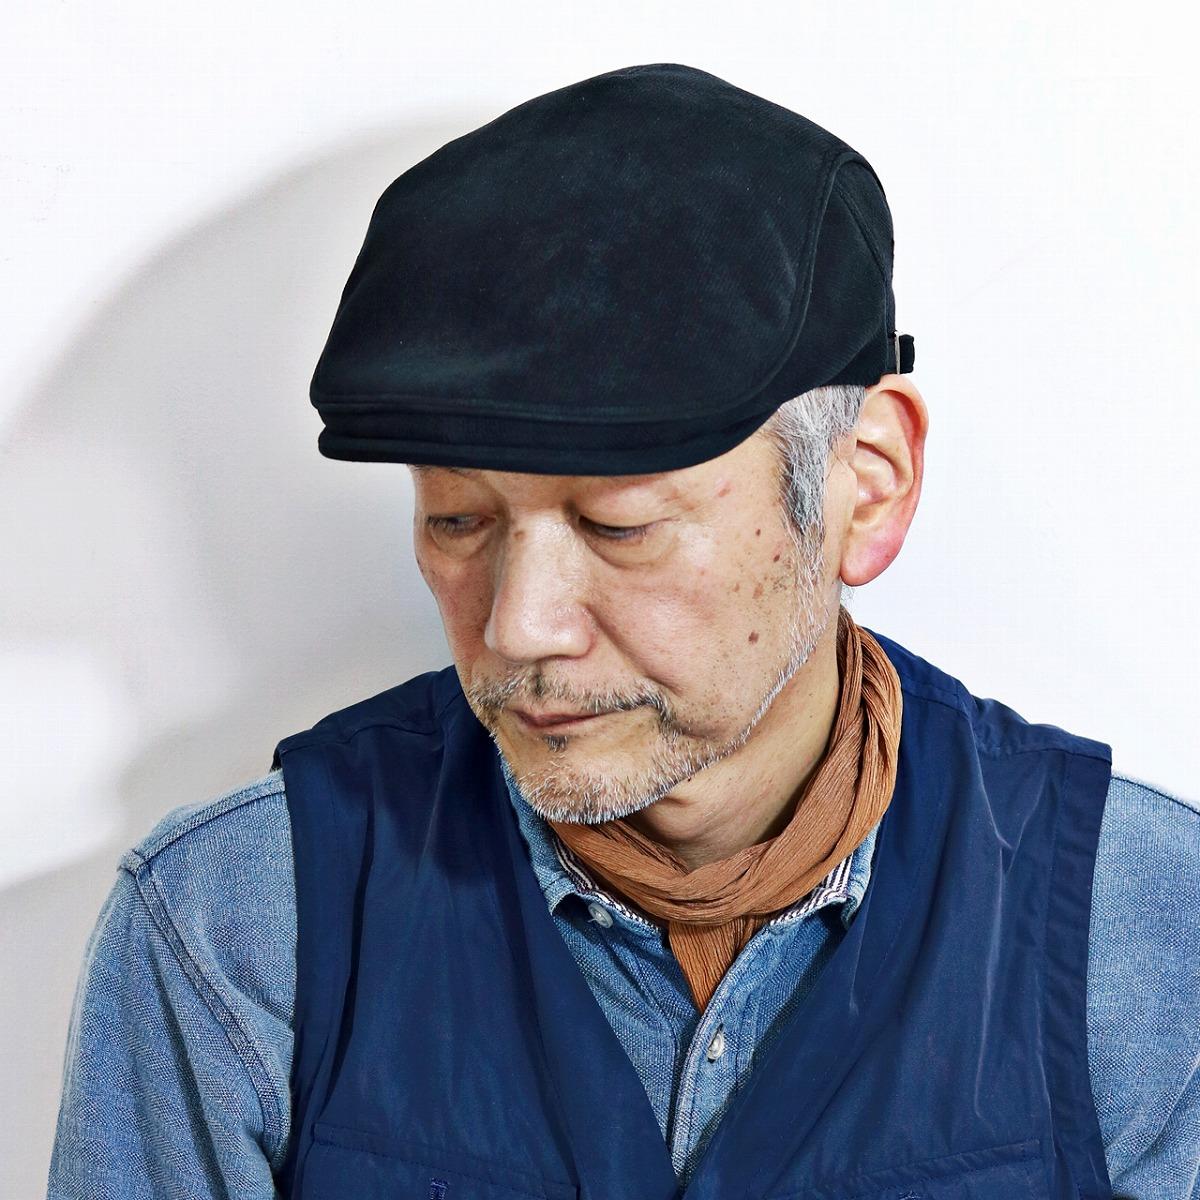 ELEHELM HAT STORE: Product made in Japan black black raised in Daks calf  suede style hunting cap men hat polyester hunting cap hat plain fabric DAKS  U.K. ...